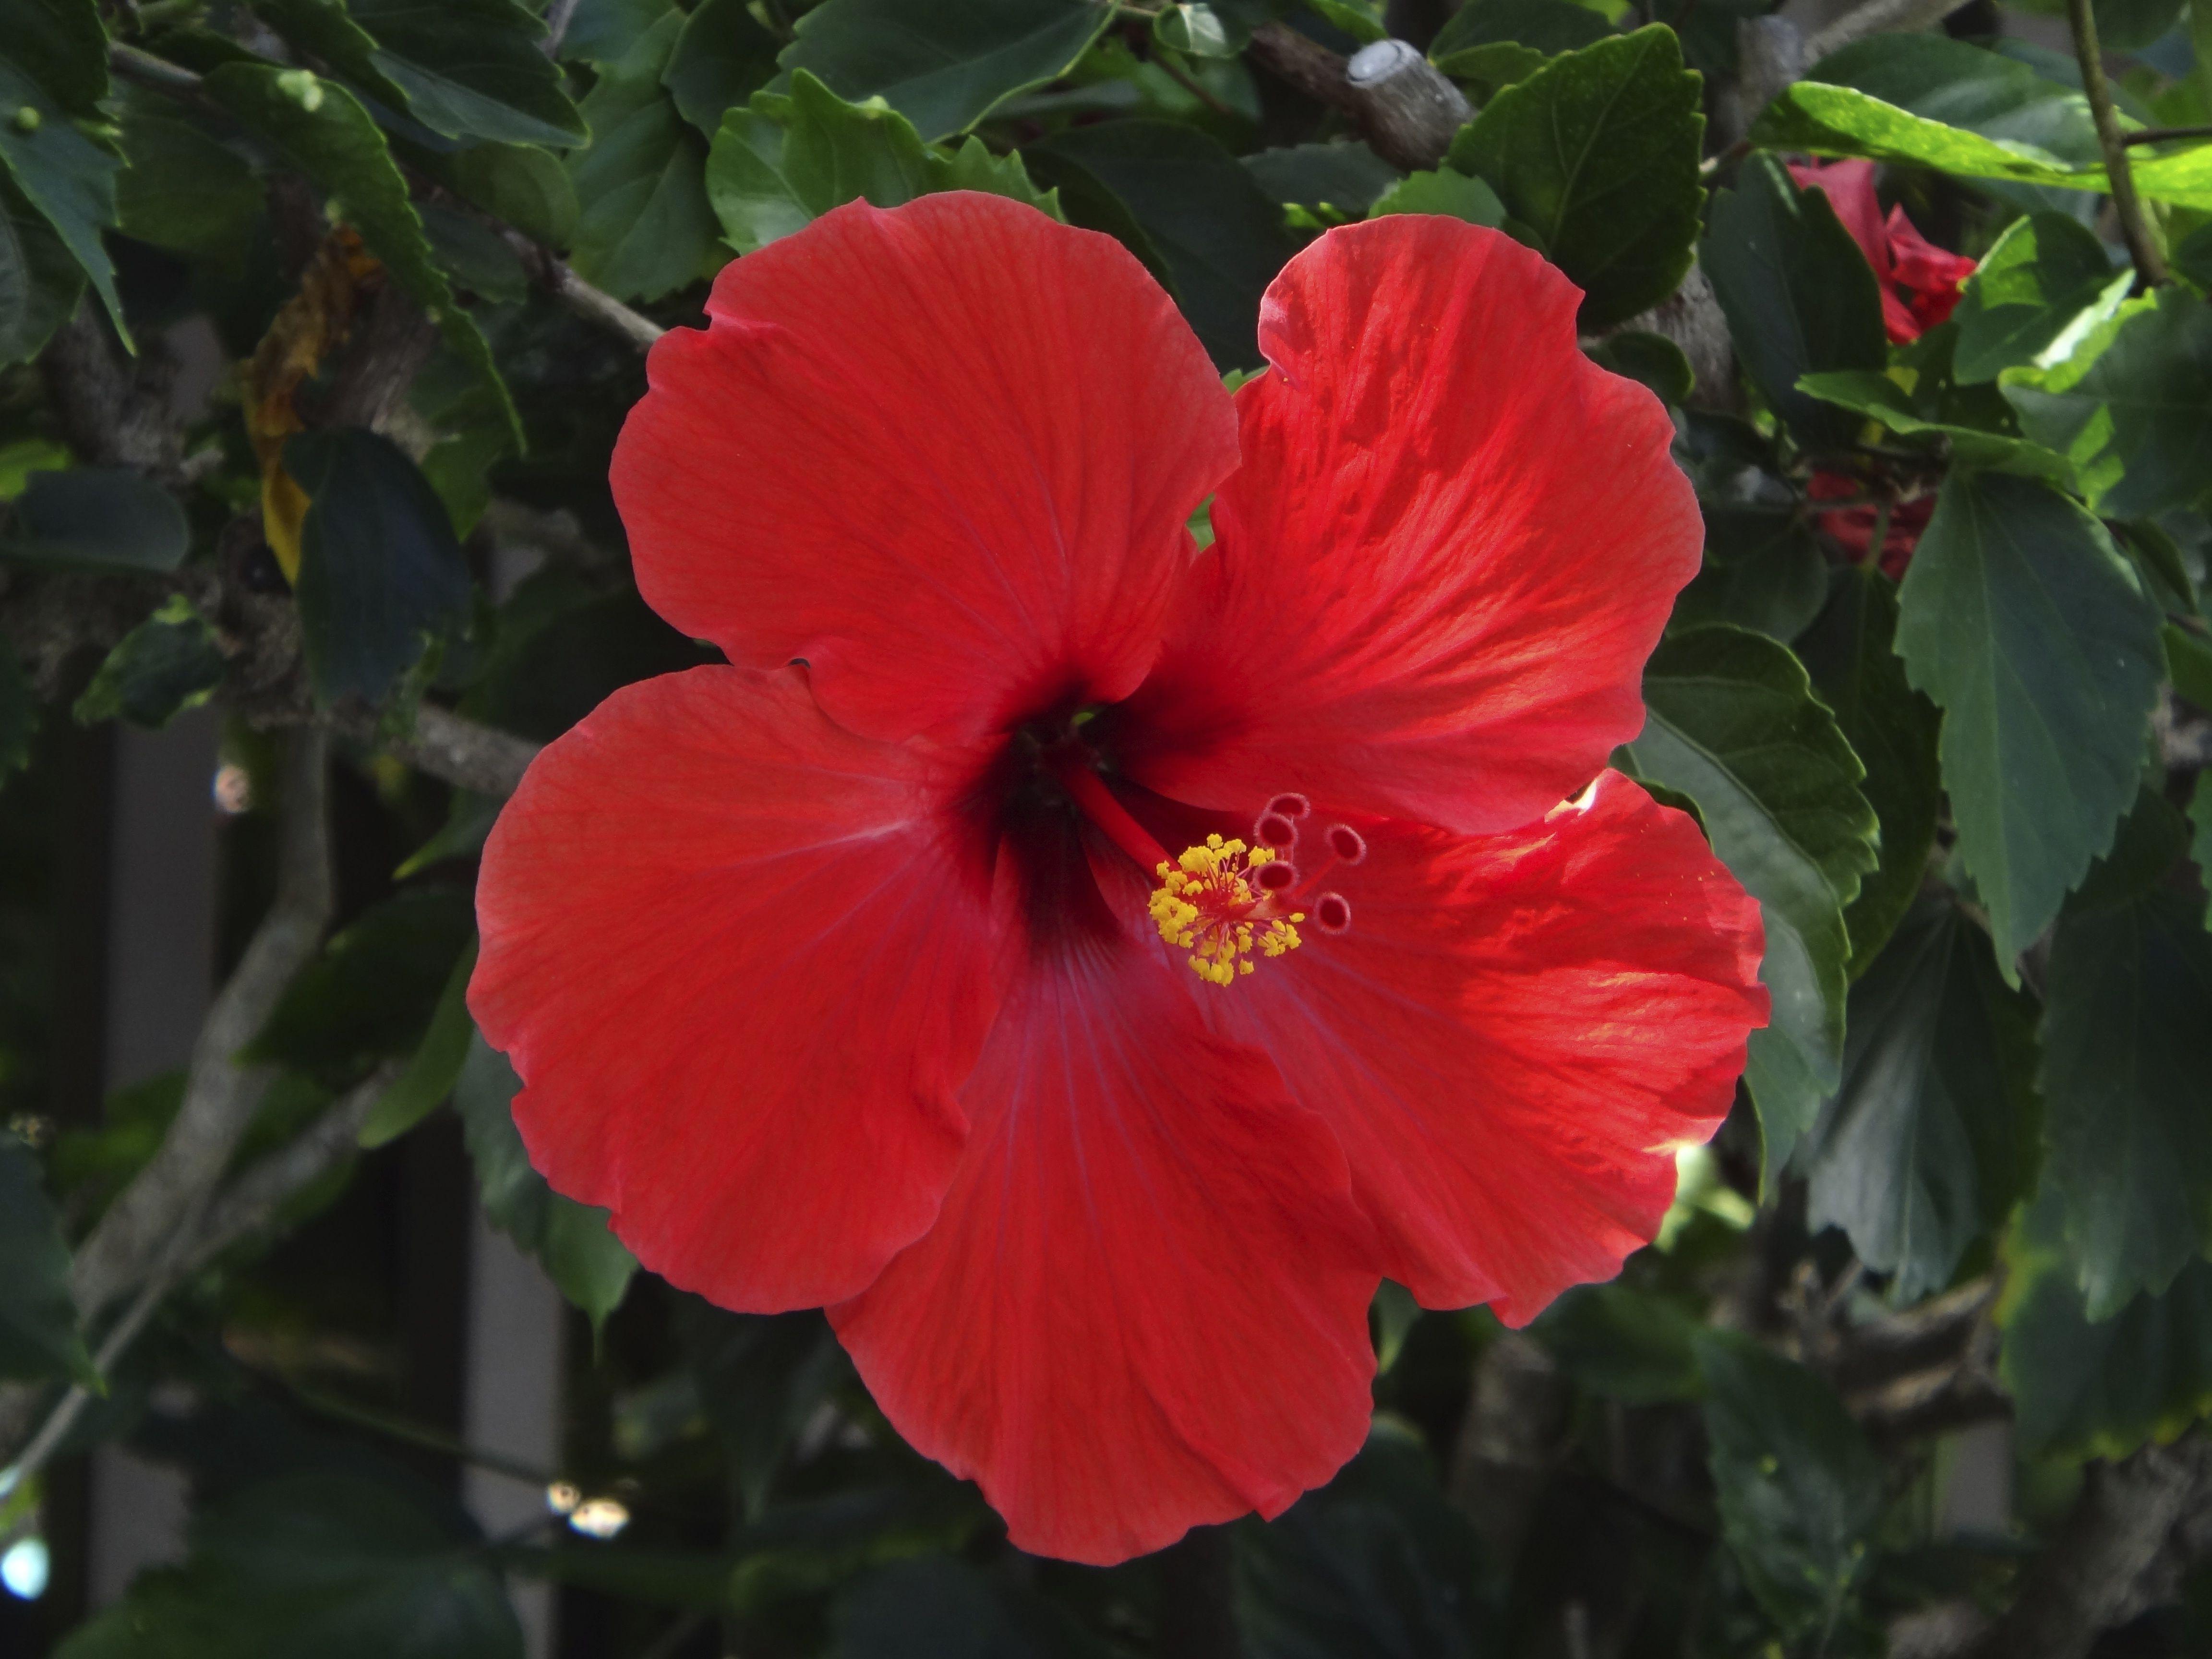 Hibiscus flower hawaii lovely pinterest hibiscus flowers hibiscus flower hawaii izmirmasajfo